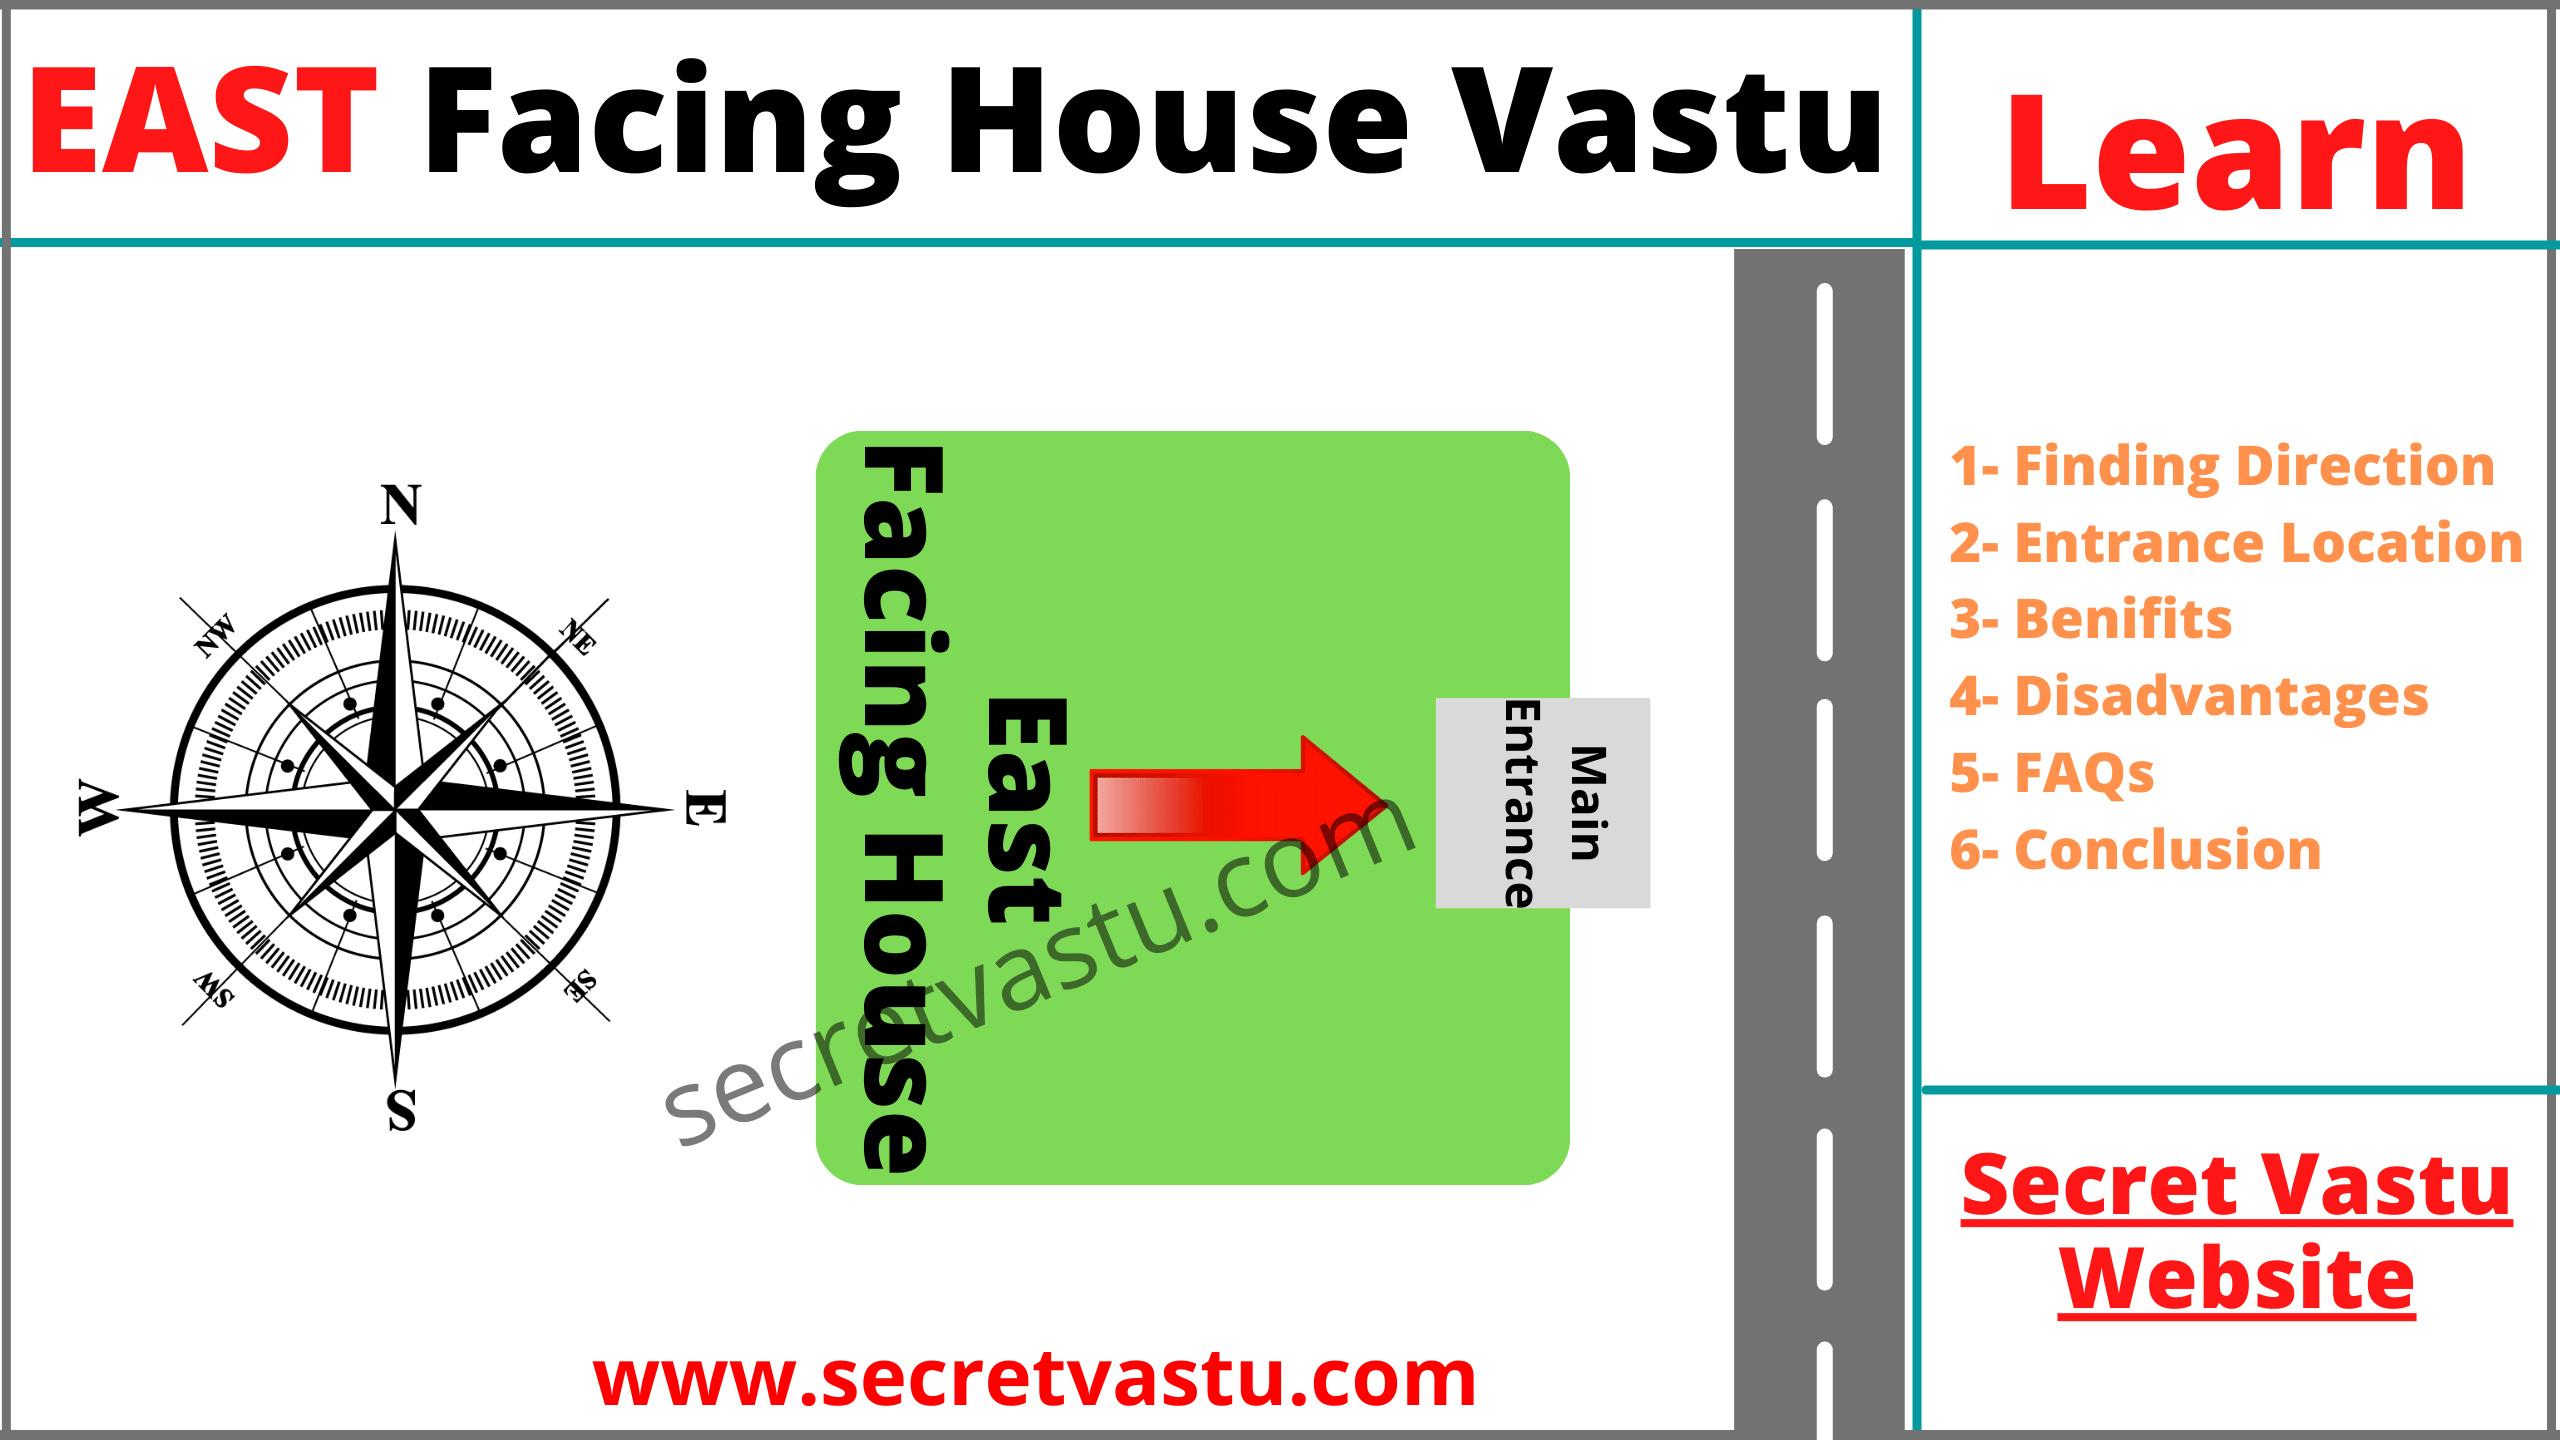 East facing house vastu tips